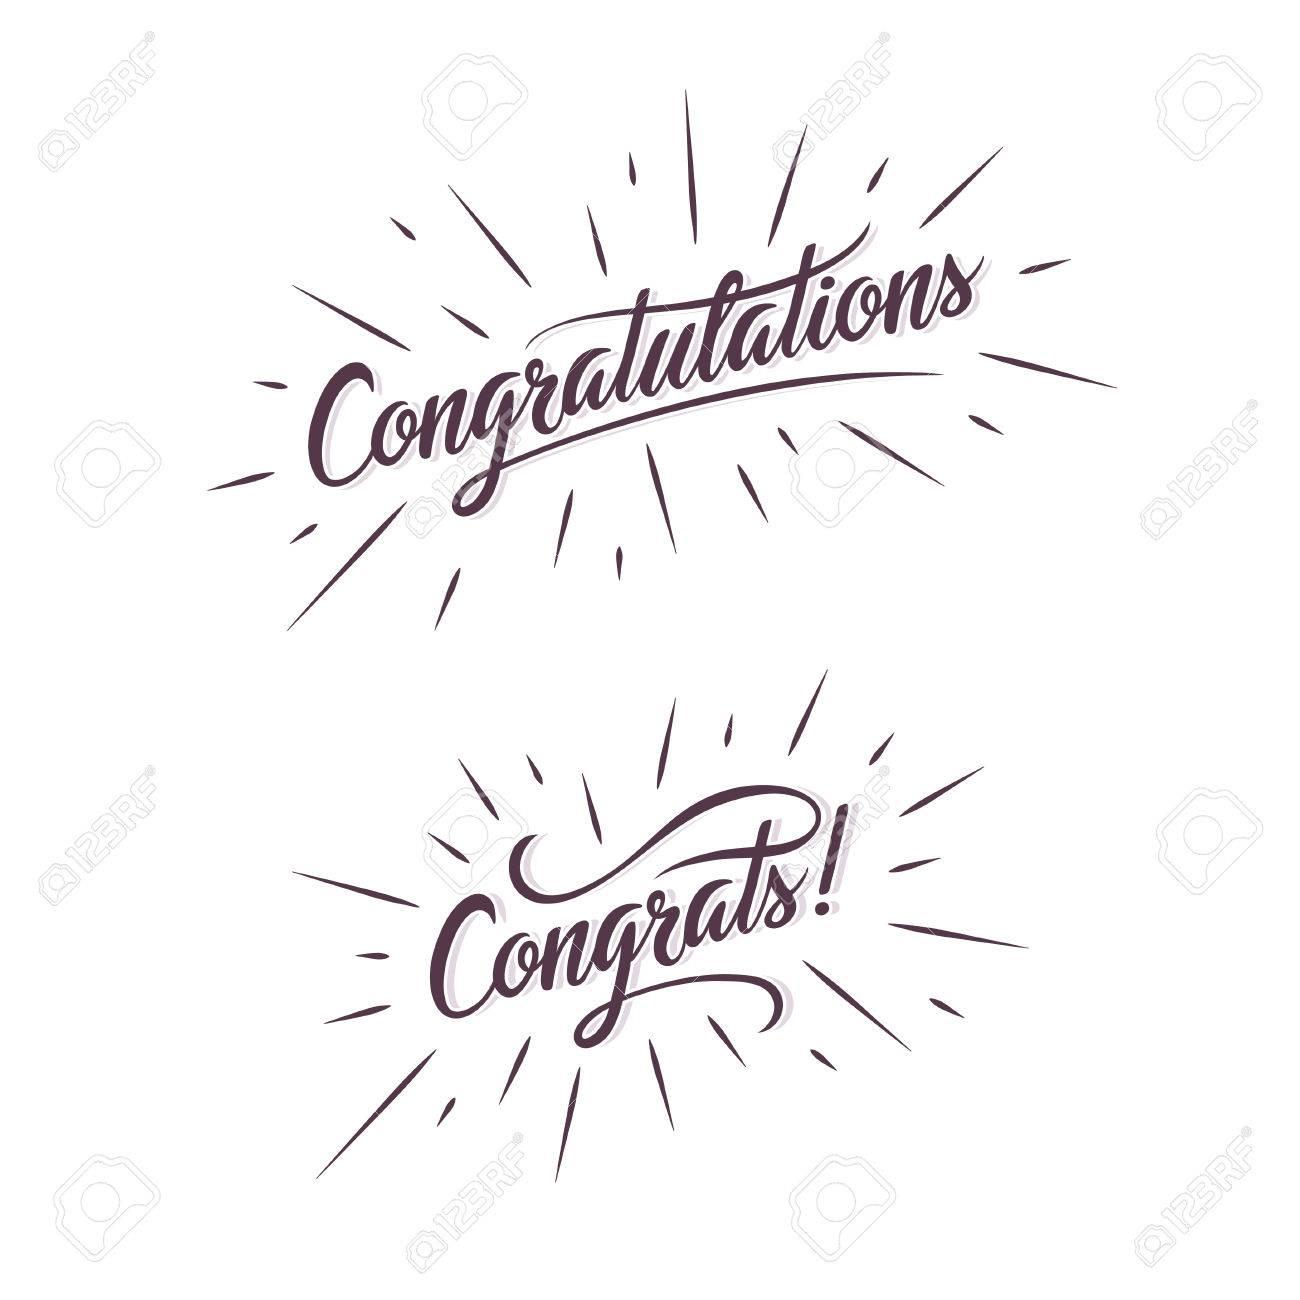 congratulations hand lettering illustration calligraphic greeting inscription handwritten typography trendy design element